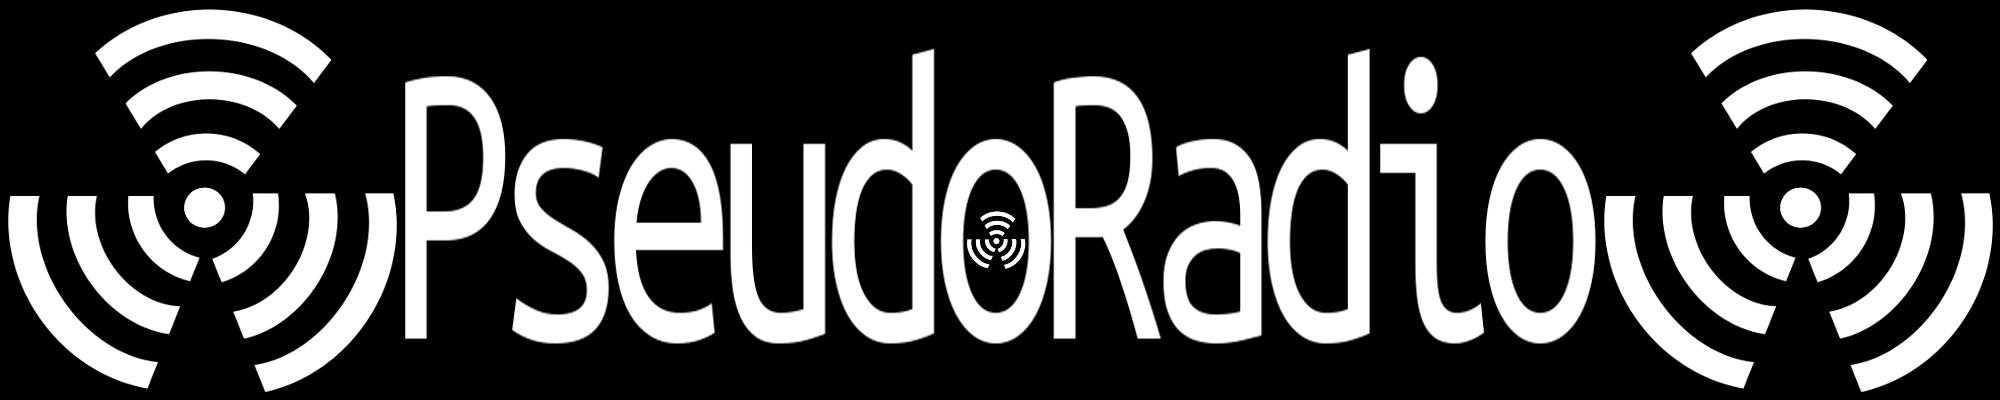 PseudoRadio